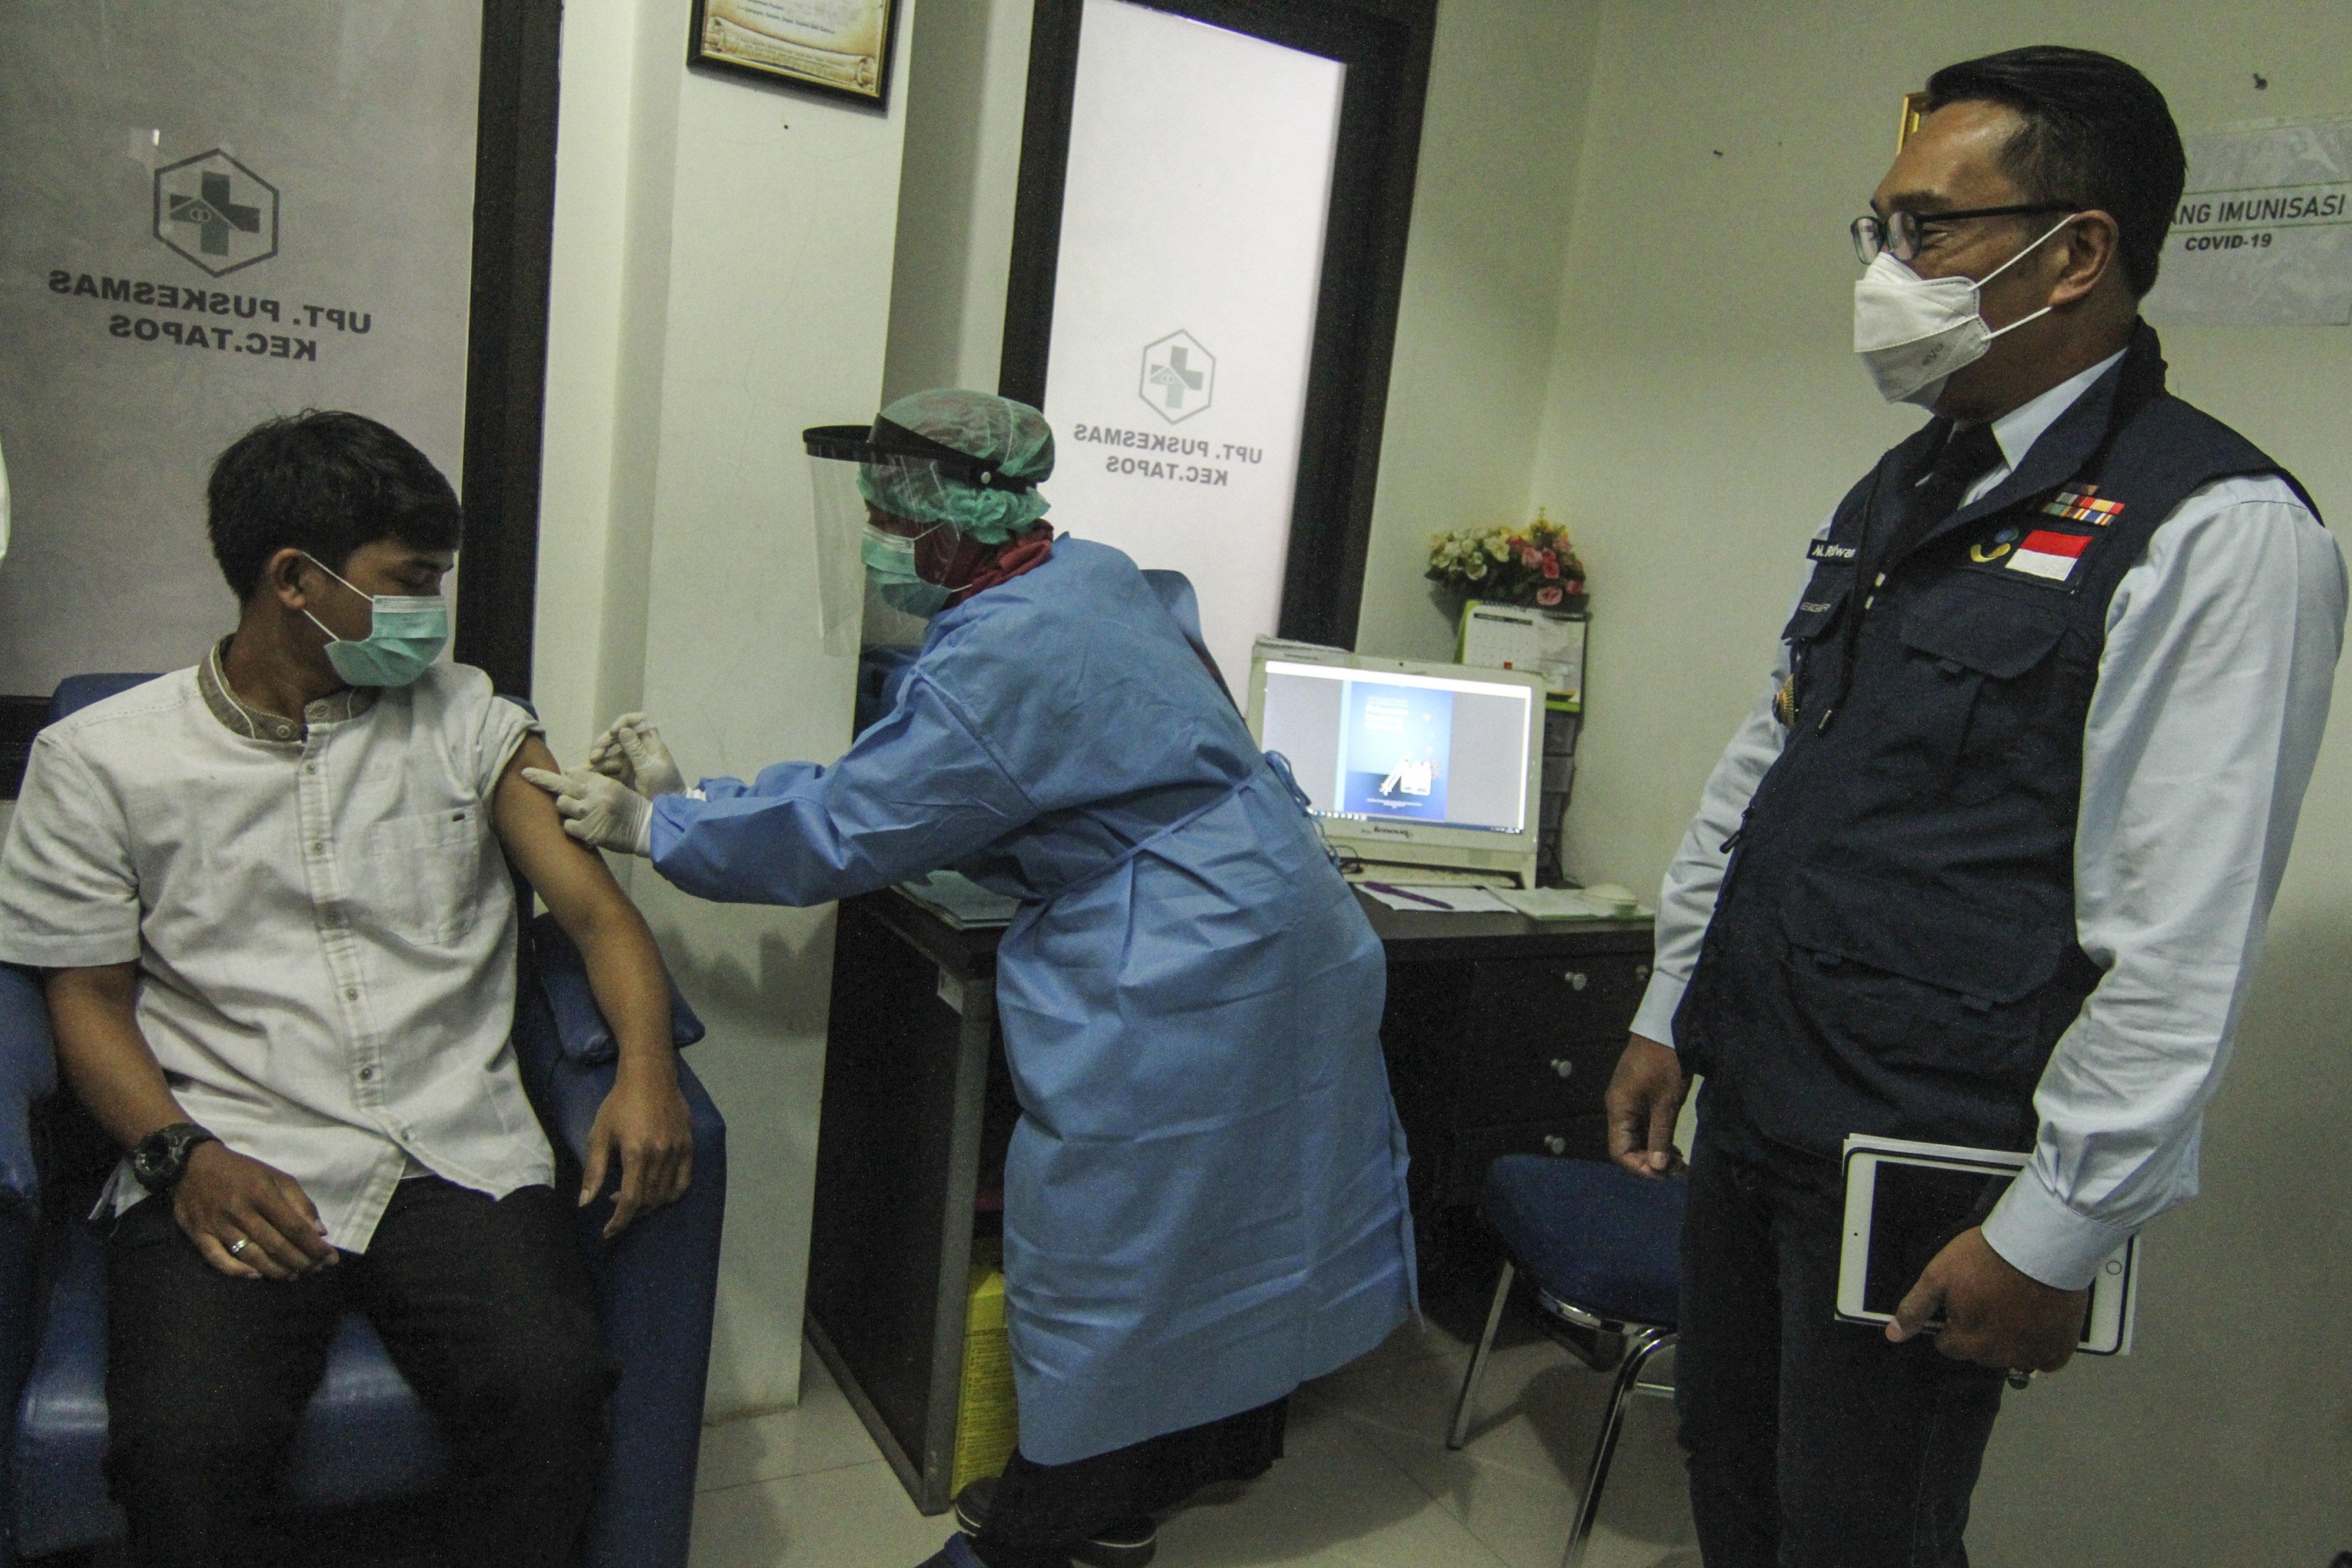 Gubernur Jawa Barat Ridwan Kamil (kanan) melihat petugas kesehatan melakukan simulasi vaksin COVID-19 di Puskesmas Tapos, Depok, Jawa Barat, Kamis (22/10/2020). Pemerintah Kota Depok menggelar simulasi vaksin COVID-19 dilakukan sesuai standar oprasional prosedur (SOP) dalam rangka persiapan vaksinasi yang rencananya akan dilaksanakan bulan November 2020.